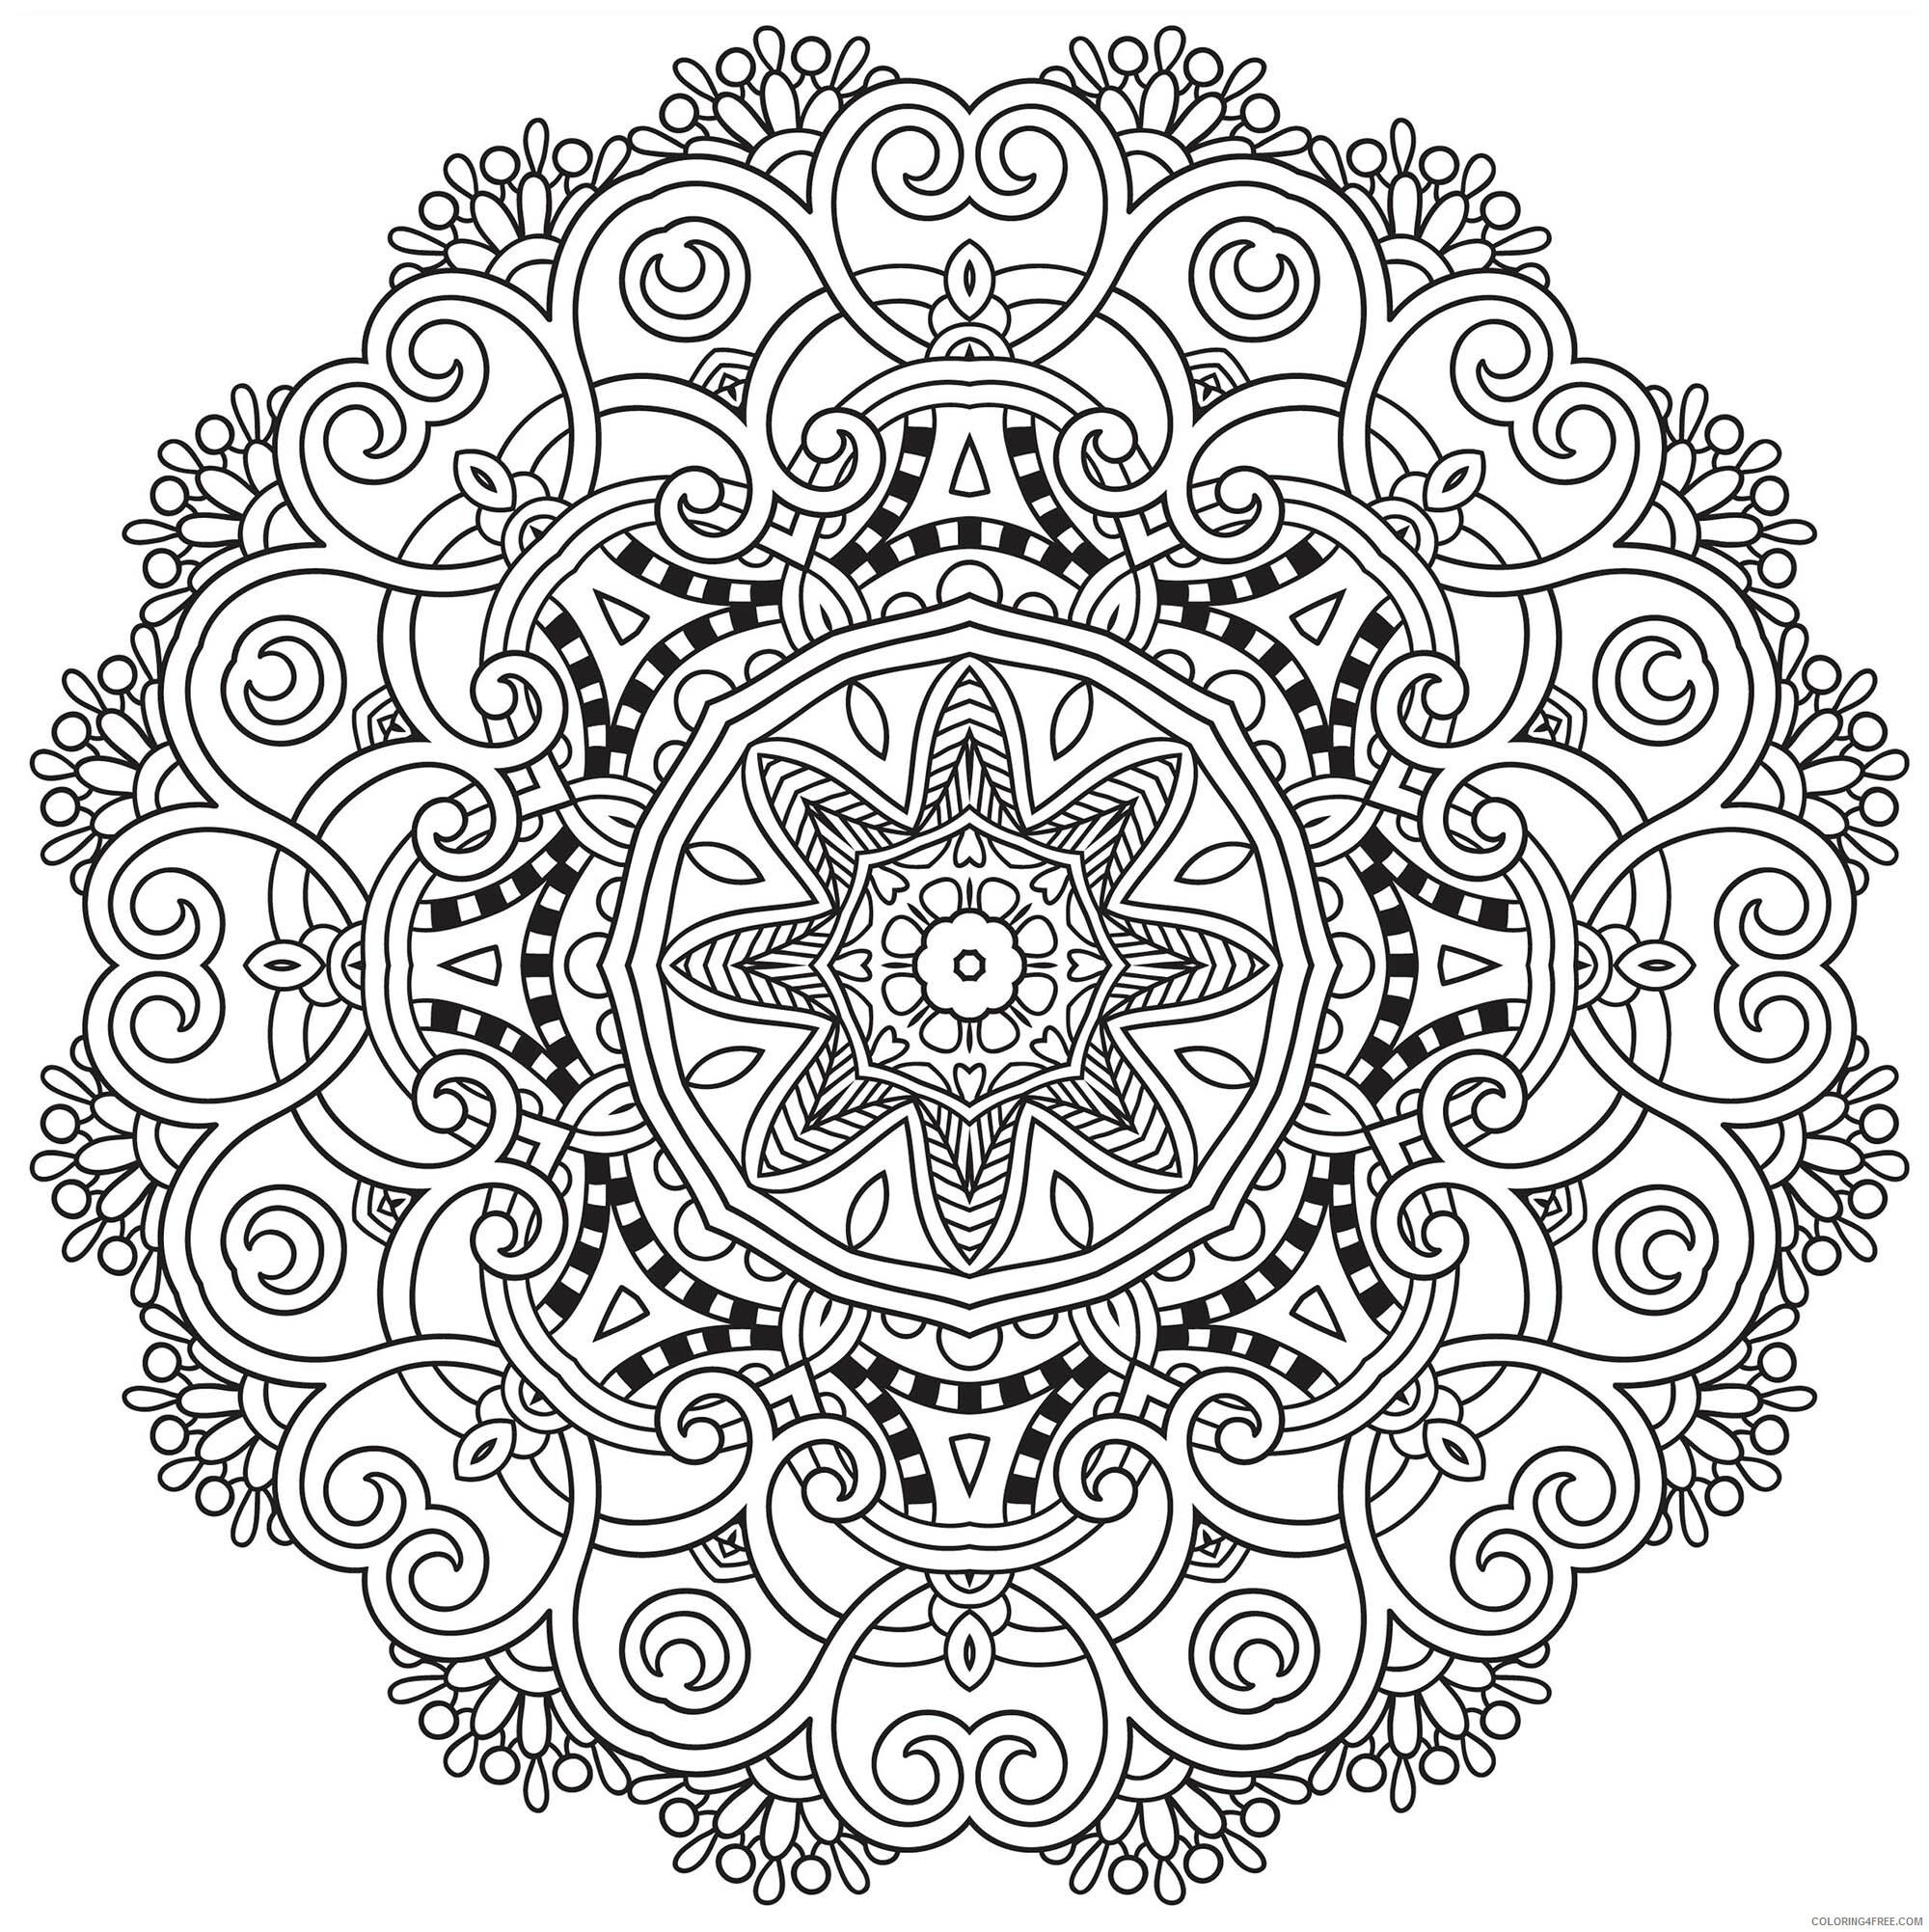 Flower Mandala Coloring Pages Adult Flower Mandala Adult Printable 2020 386 Coloring4free